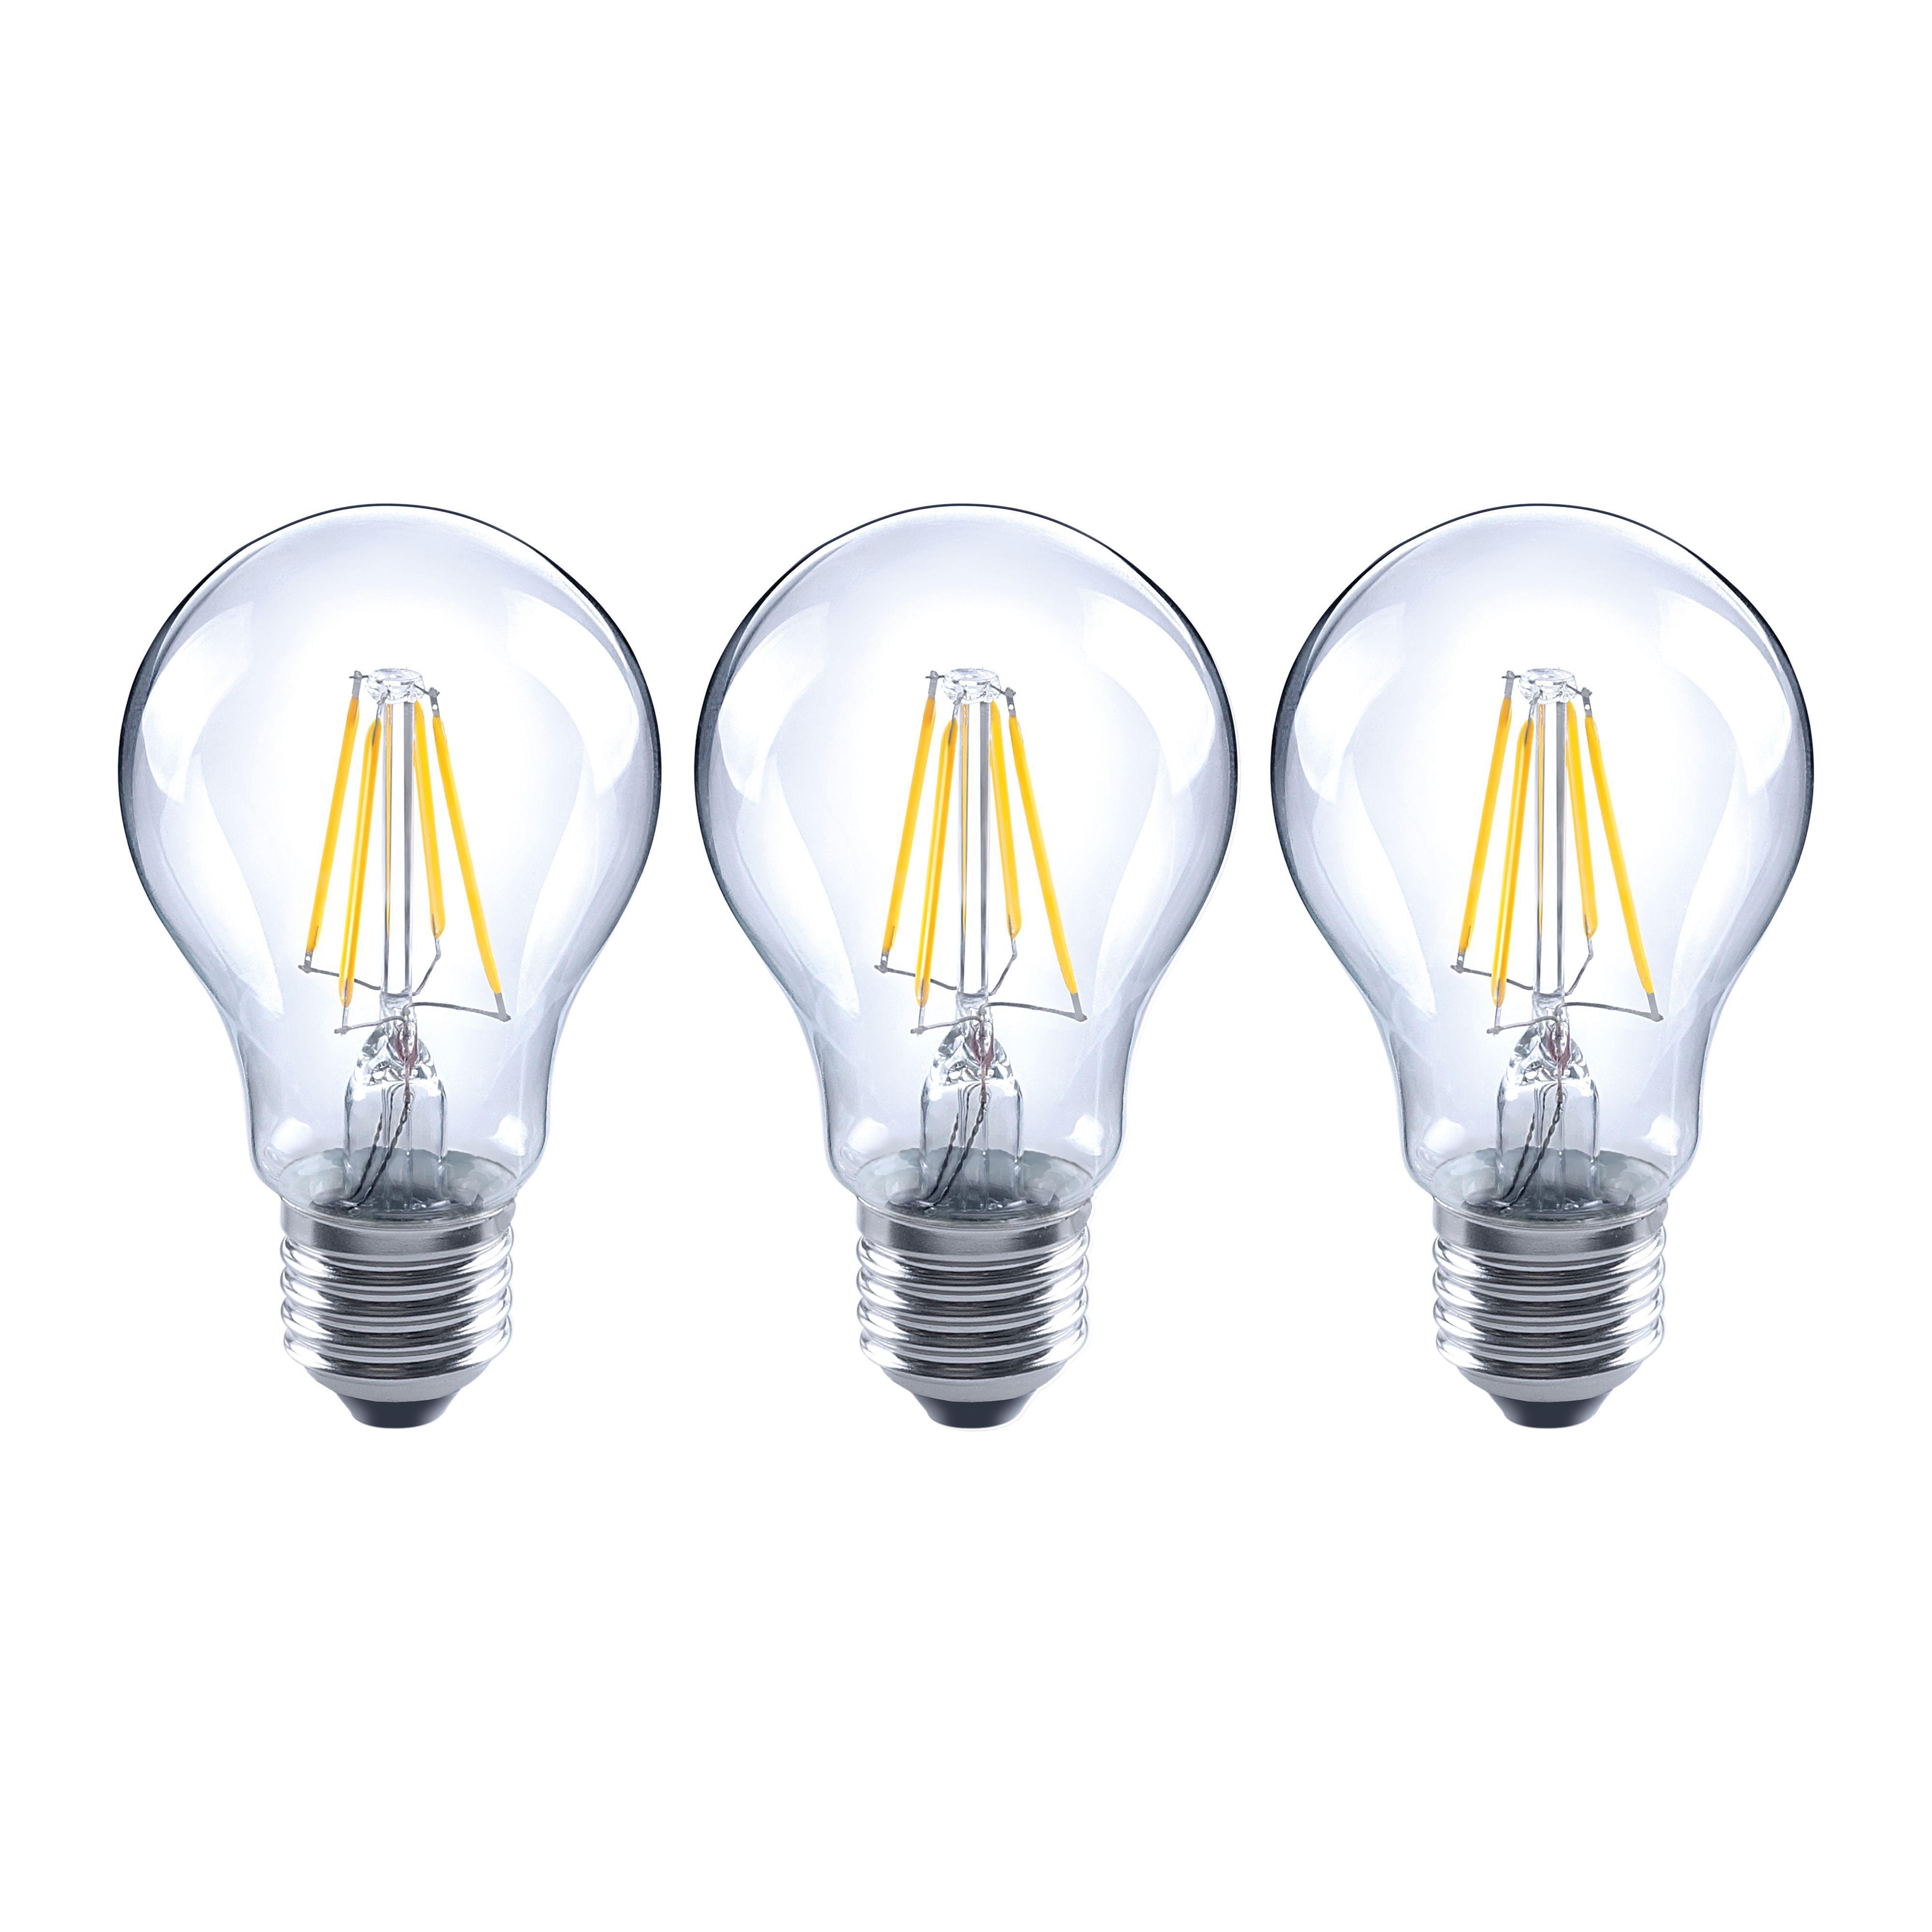 diall e27 4w led filament gls light bulb pack of 3